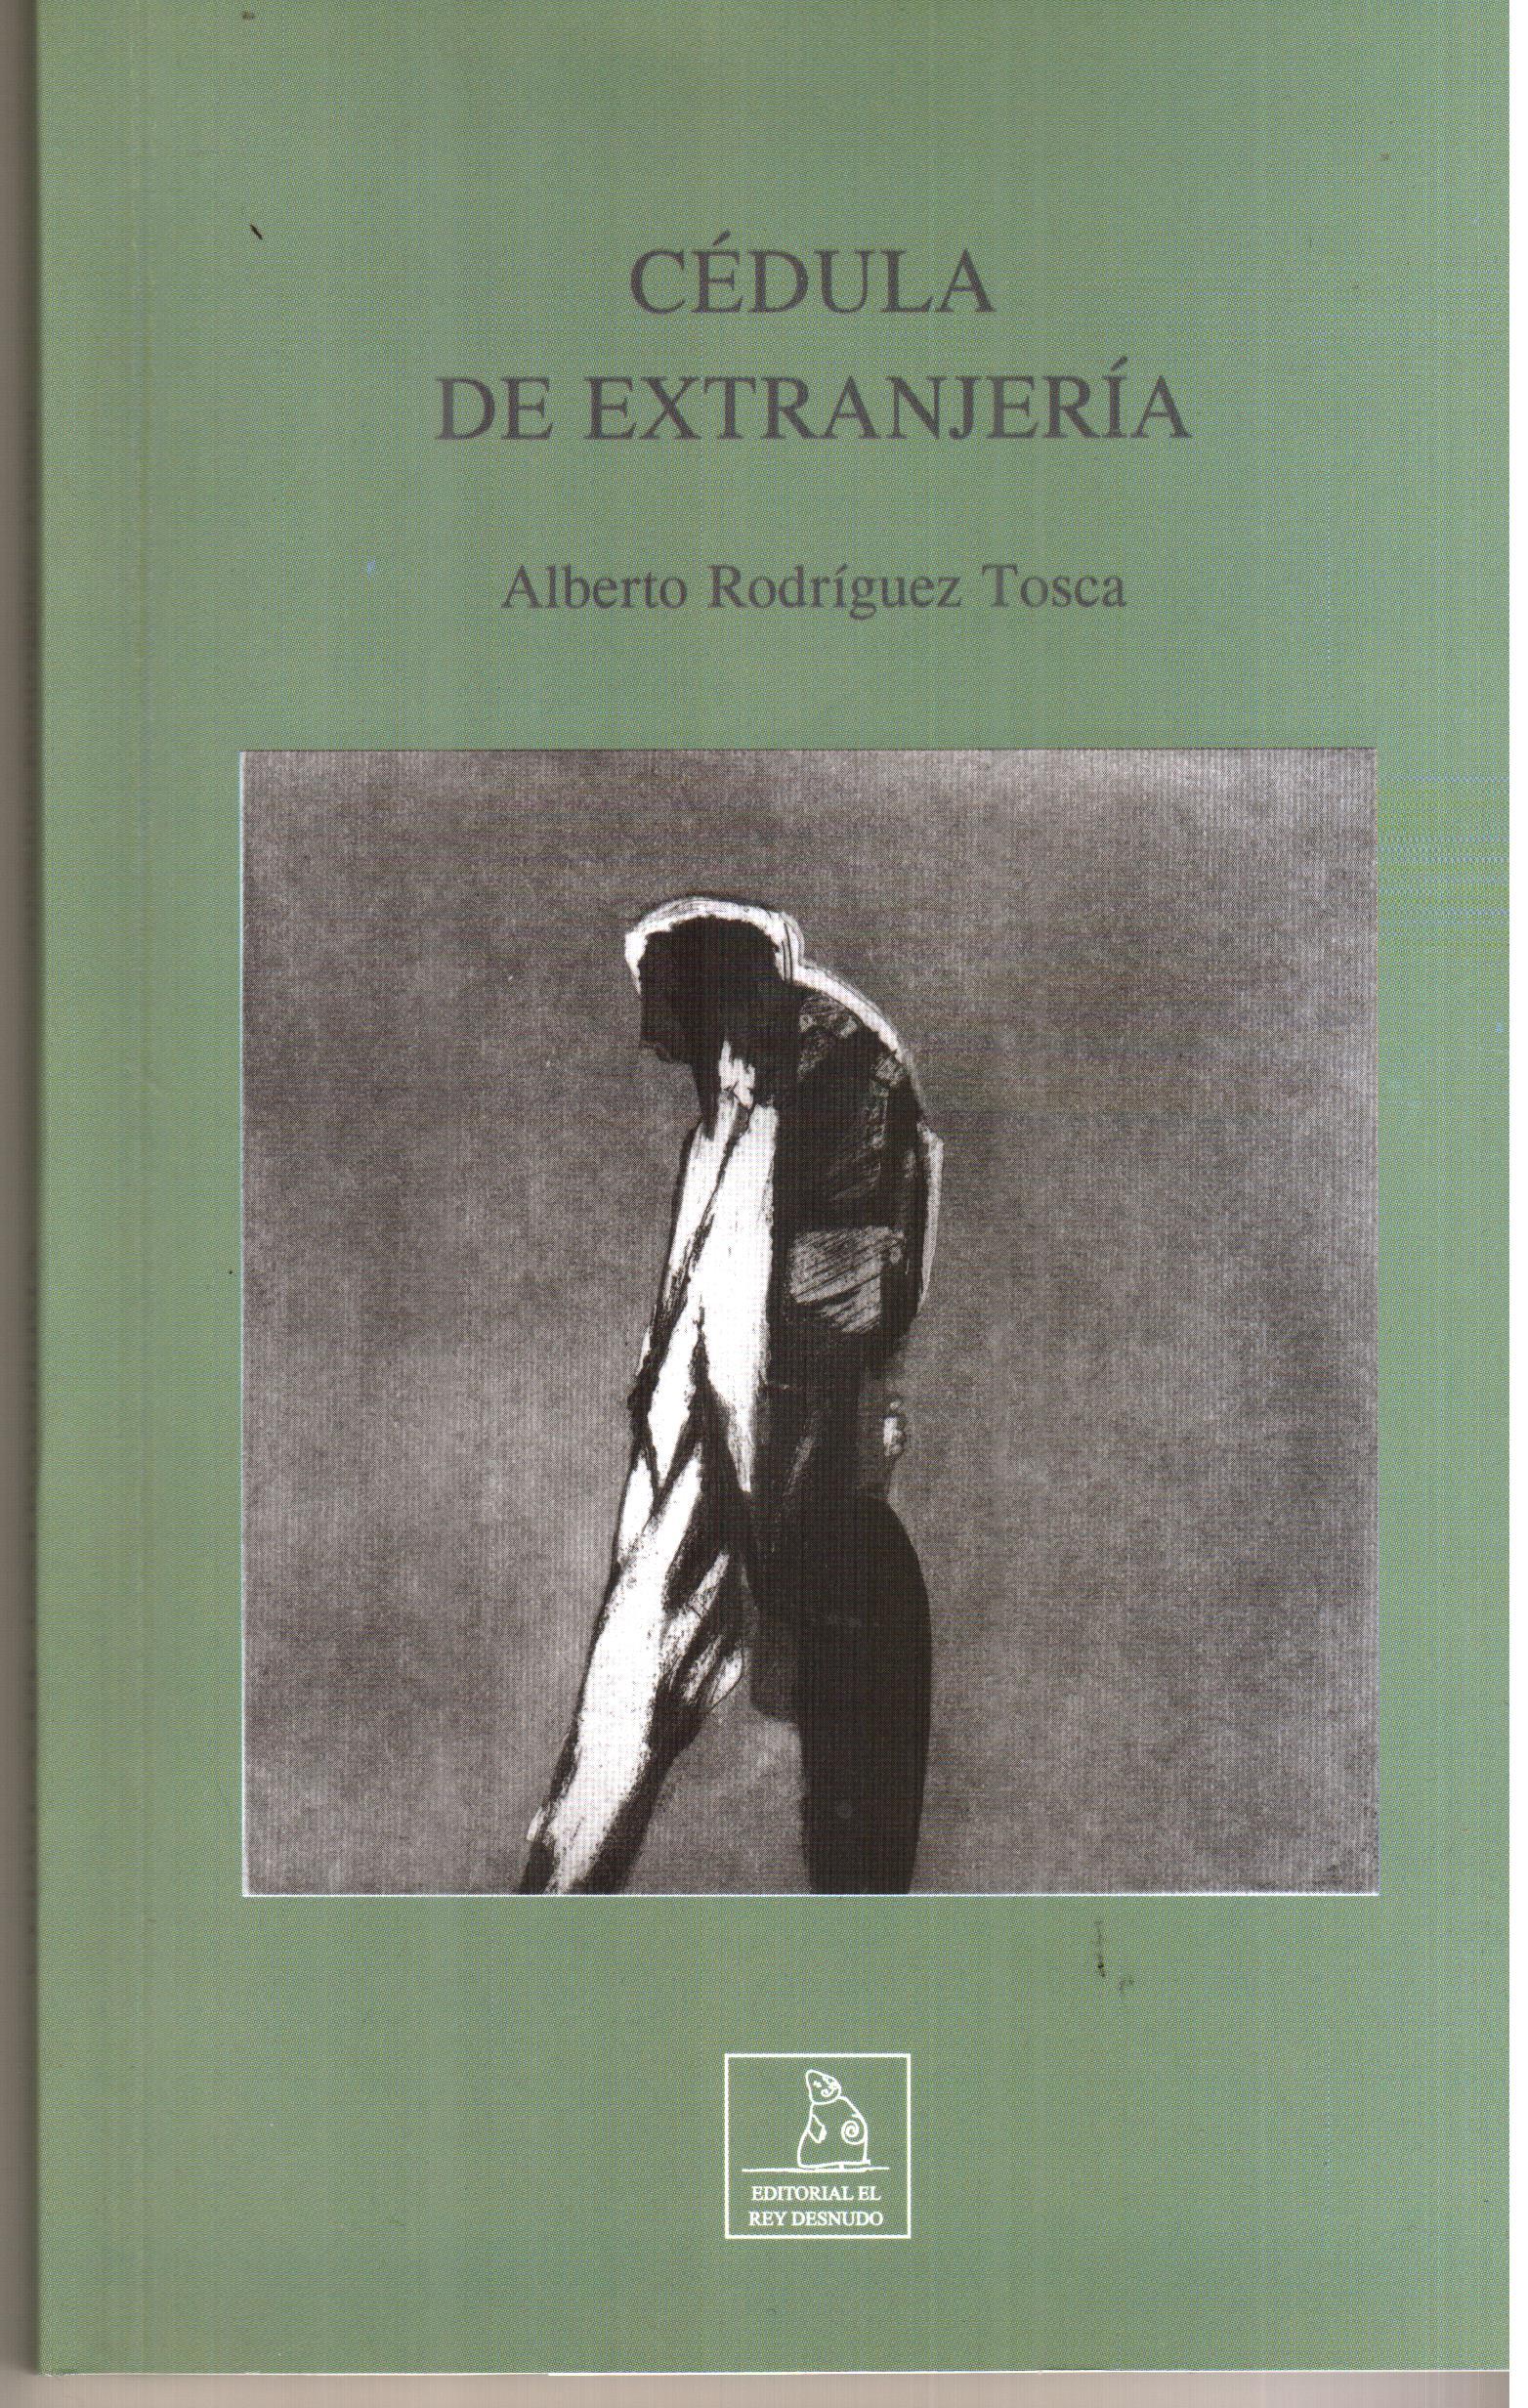 """Cédula de extranjería"", Alberto Rodríguez Tosca."